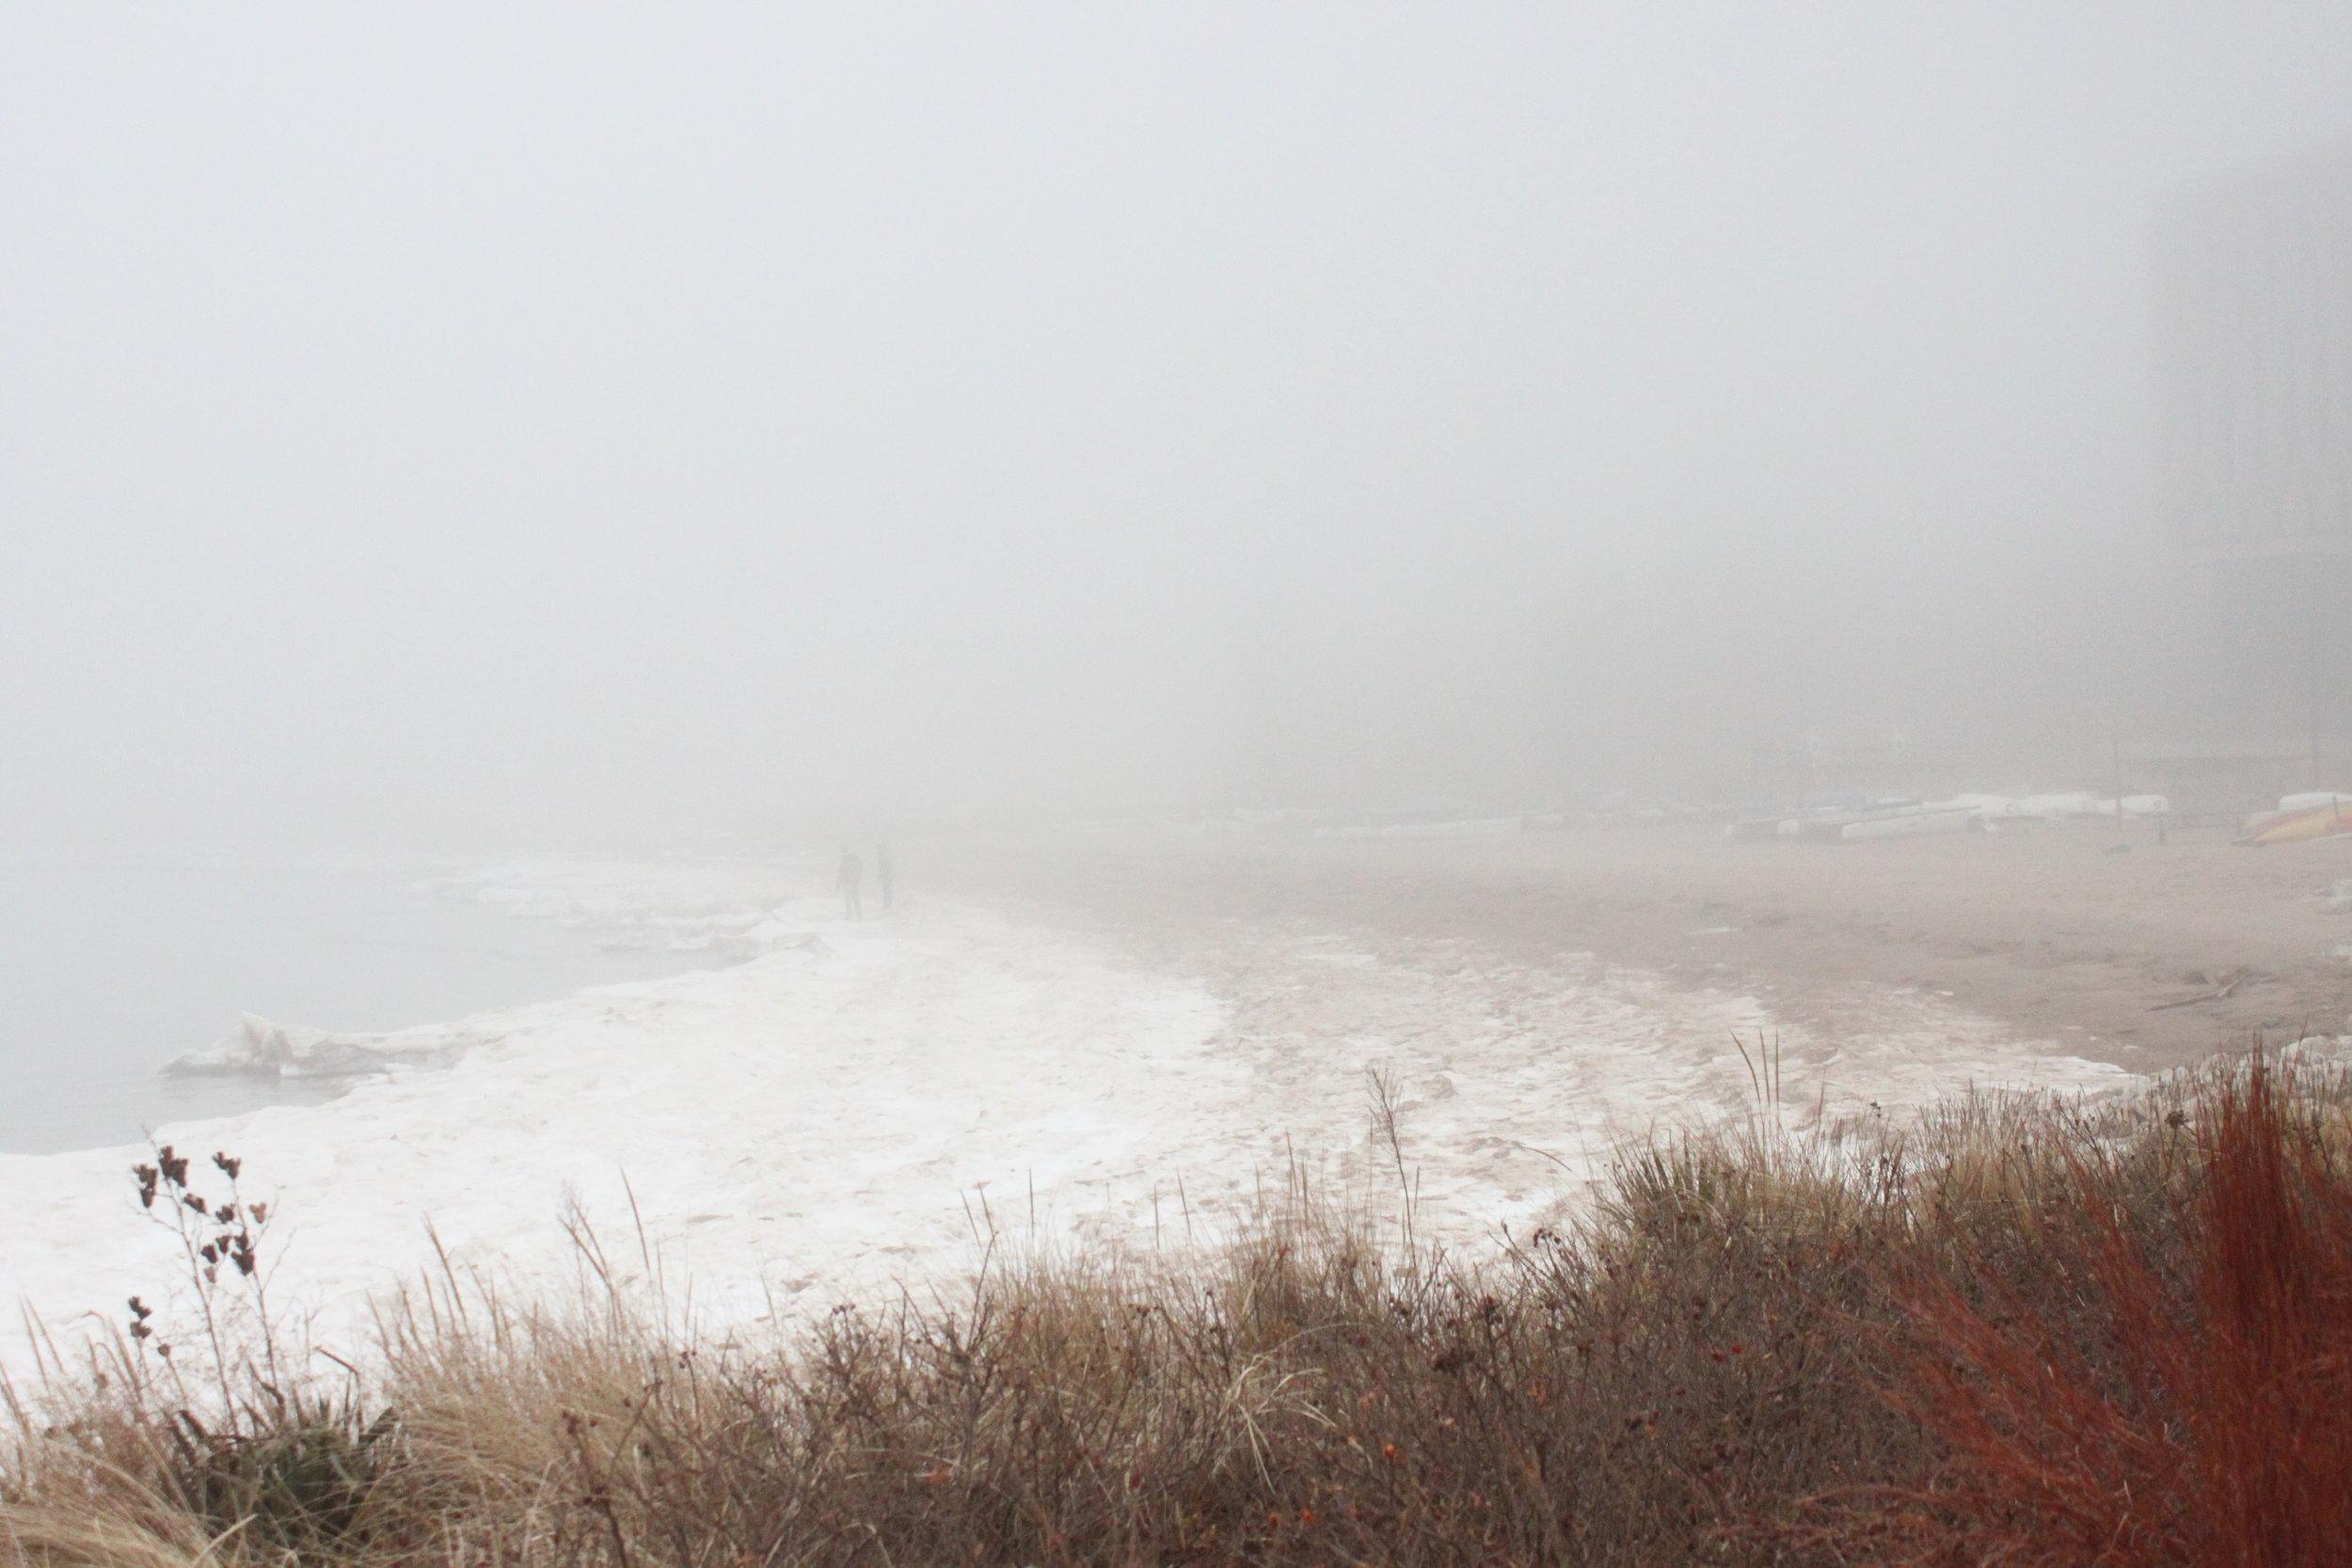 View of Lake Michigan from the Northwestern Beach